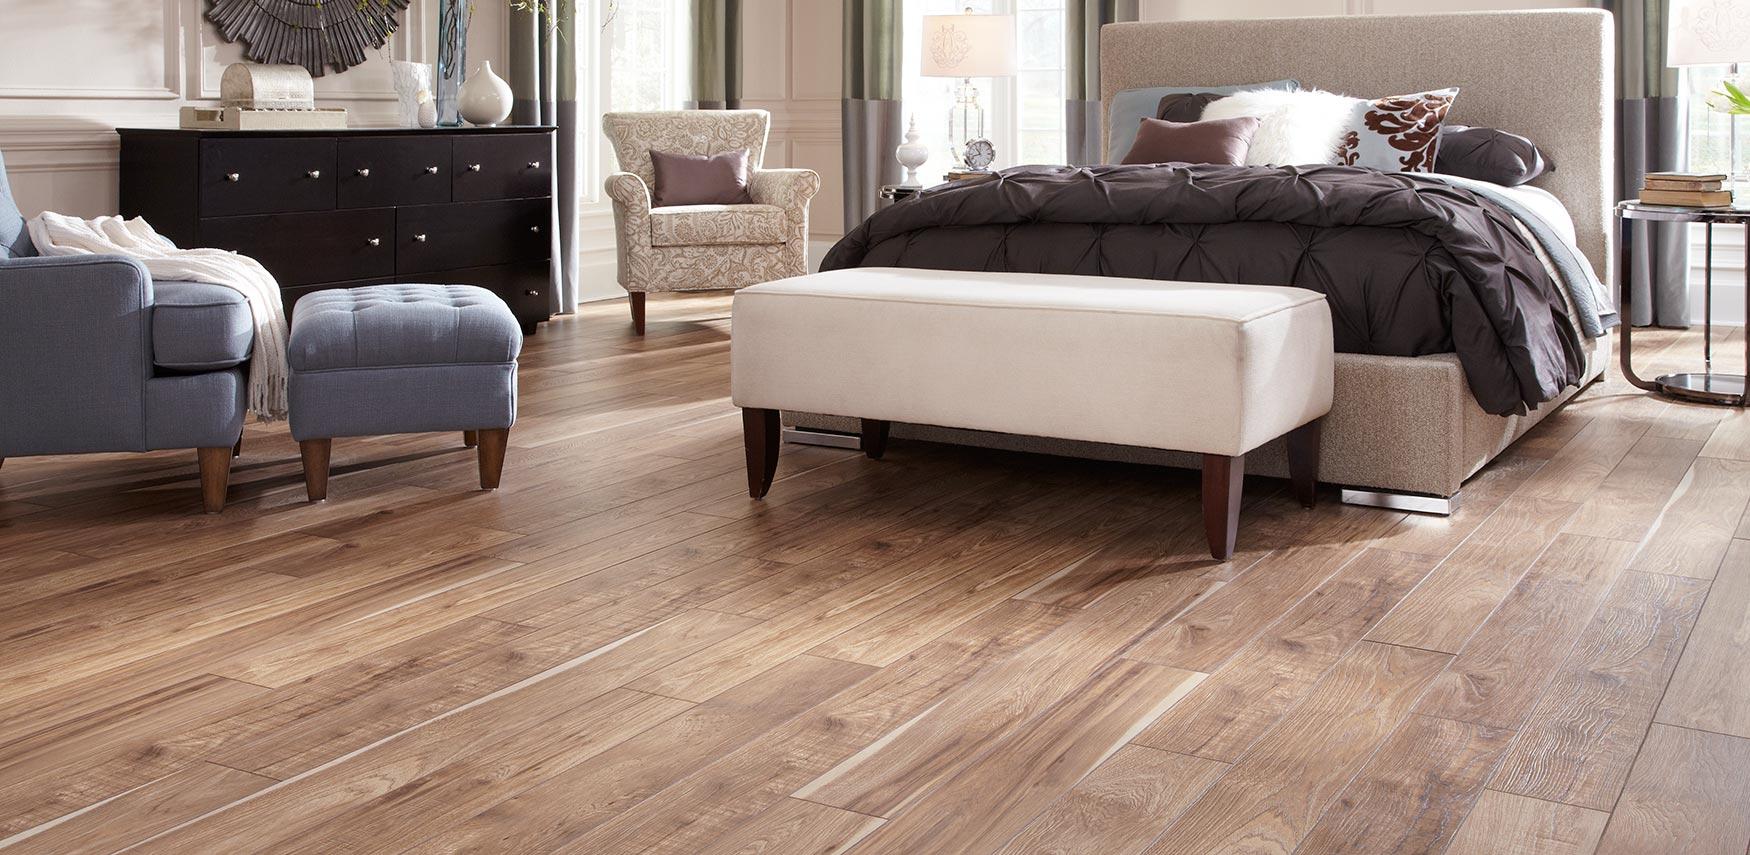 Floor Coverings Solution